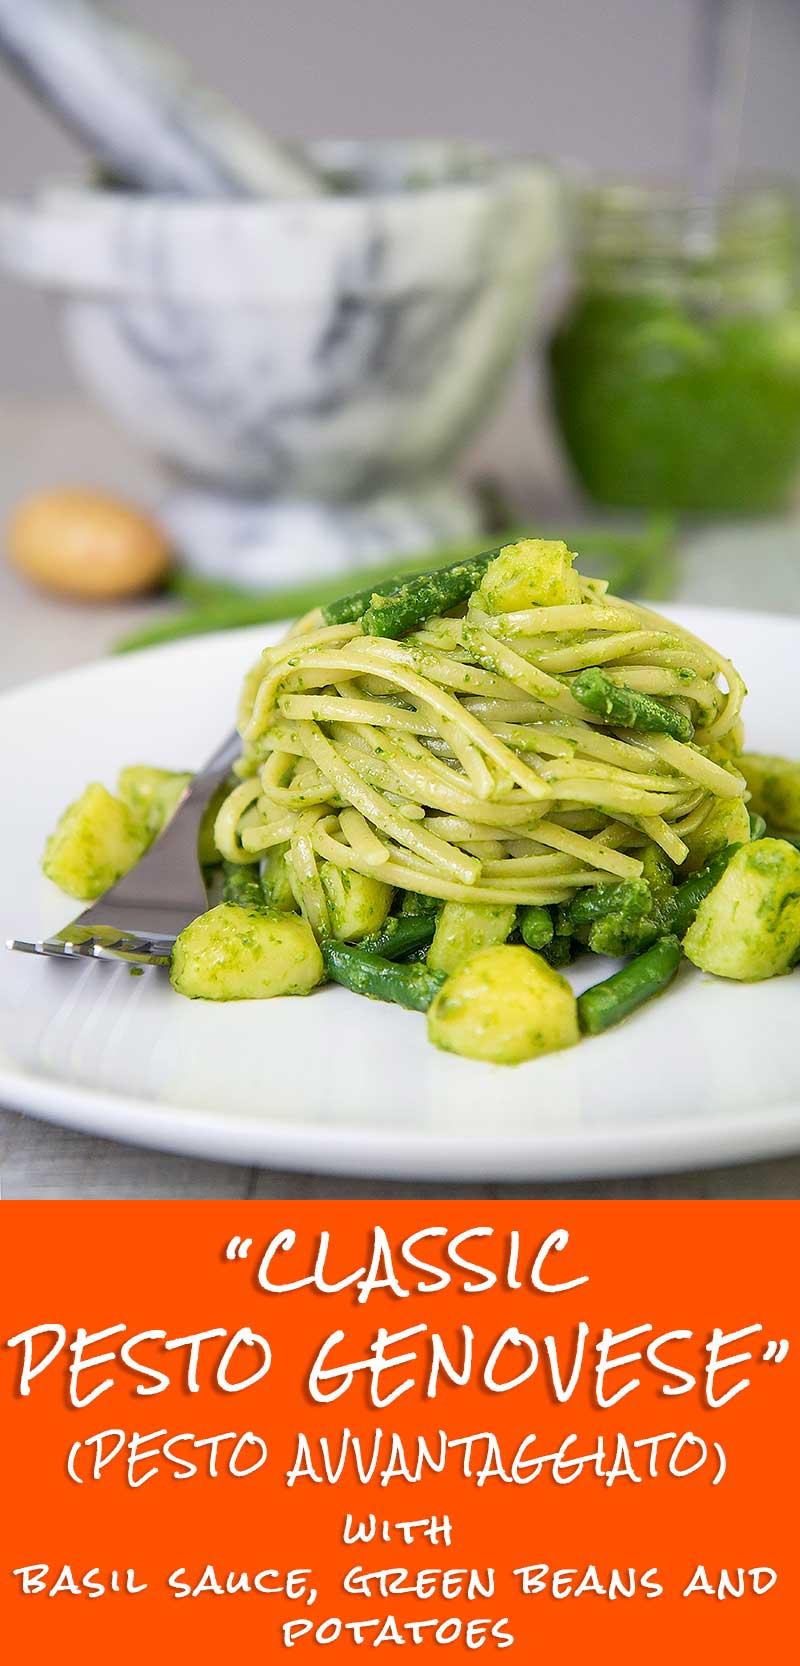 PESTO GENOVESE with green beans and potatoes (pesto avantaggiato)